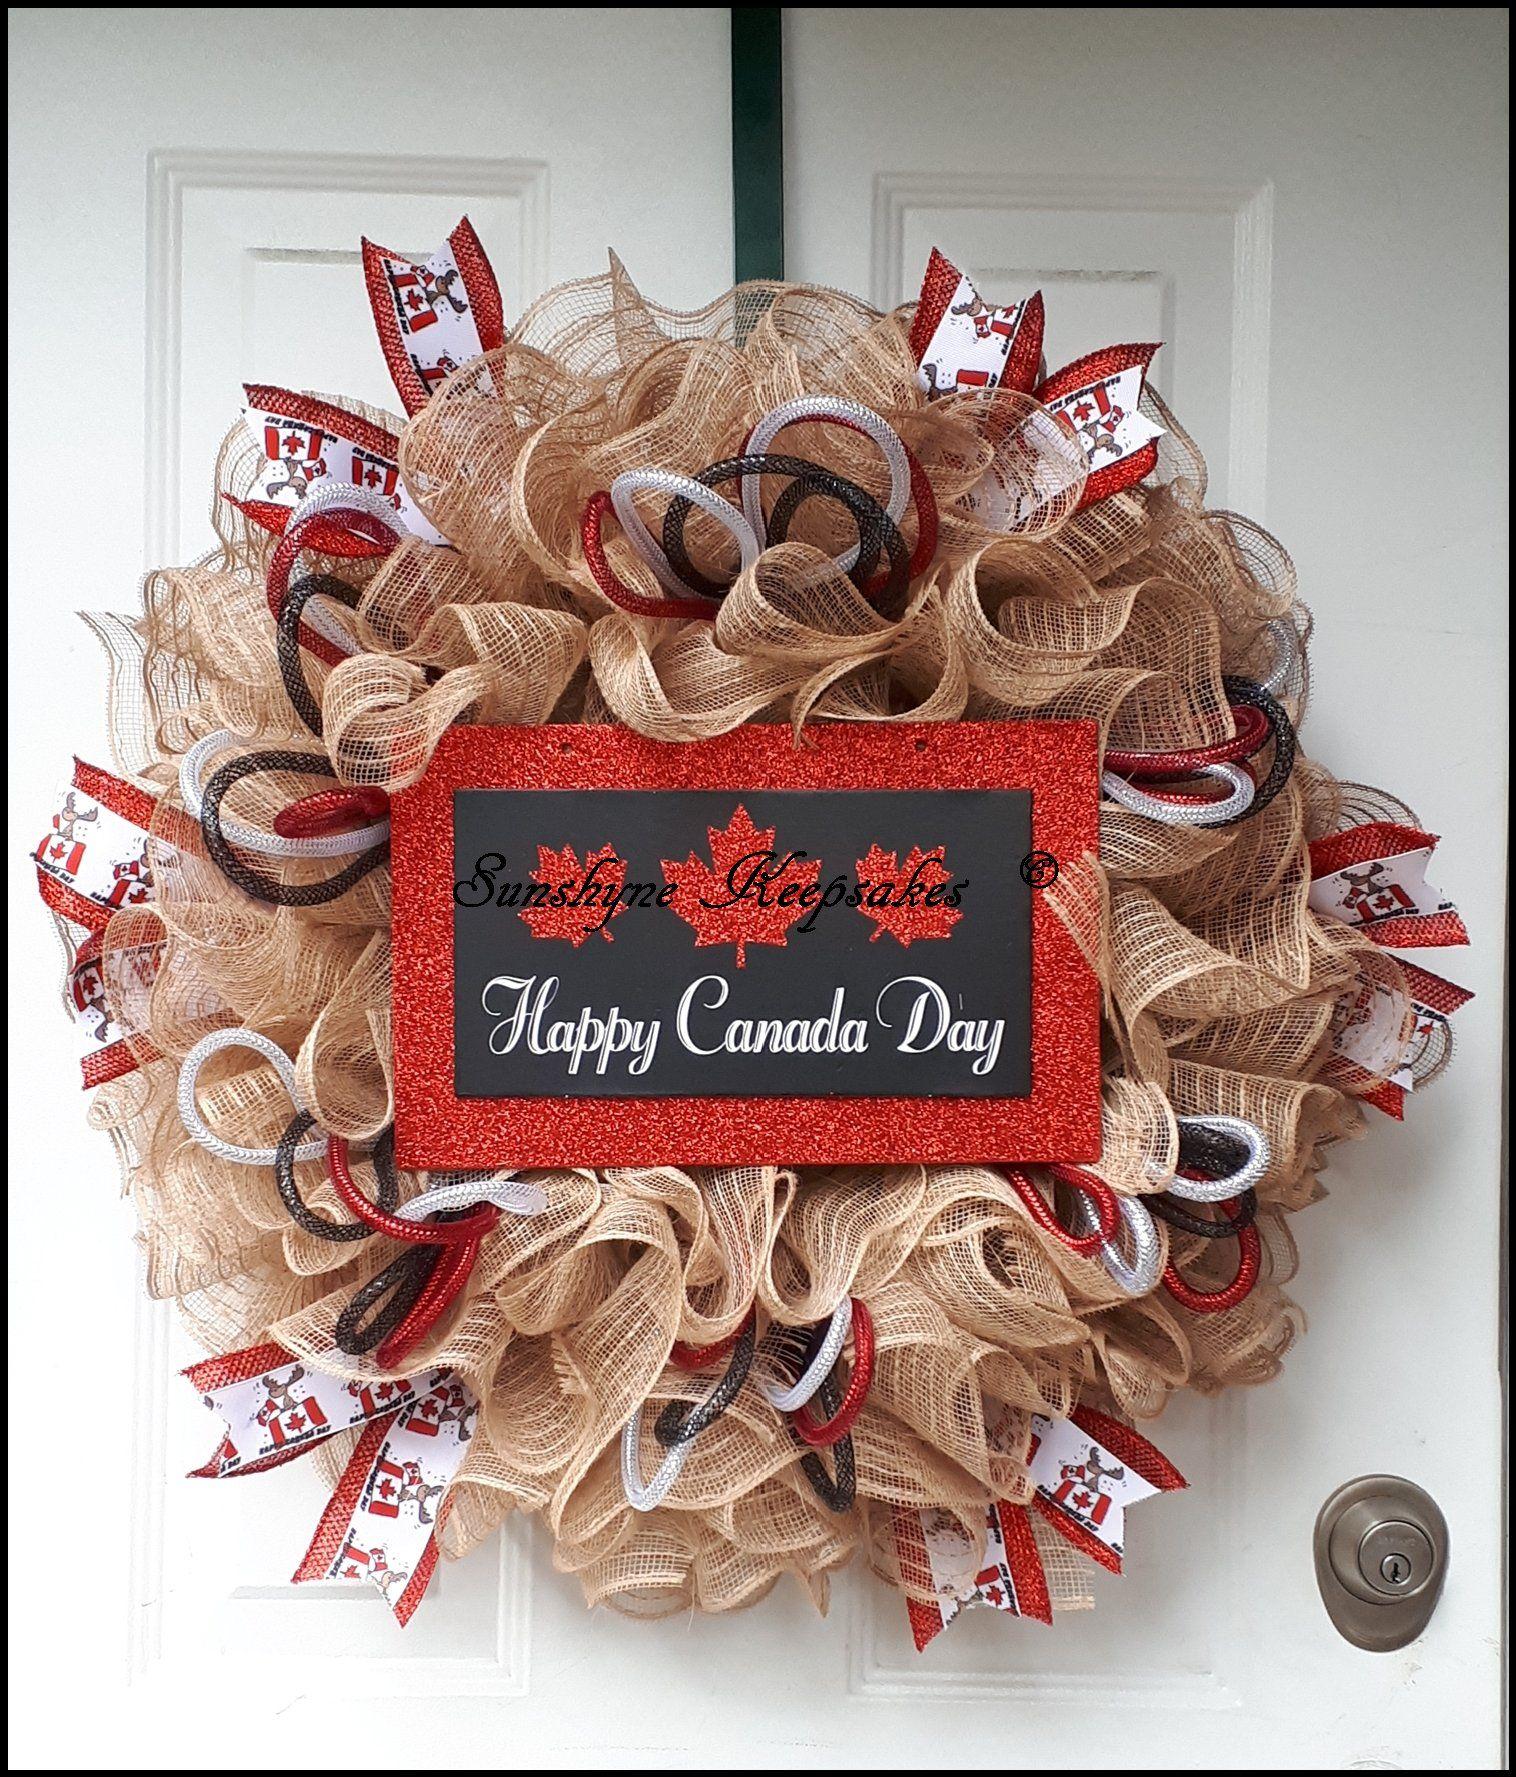 Pin by TracieDawn on Jamma's Wreaths Mesh door wreaths